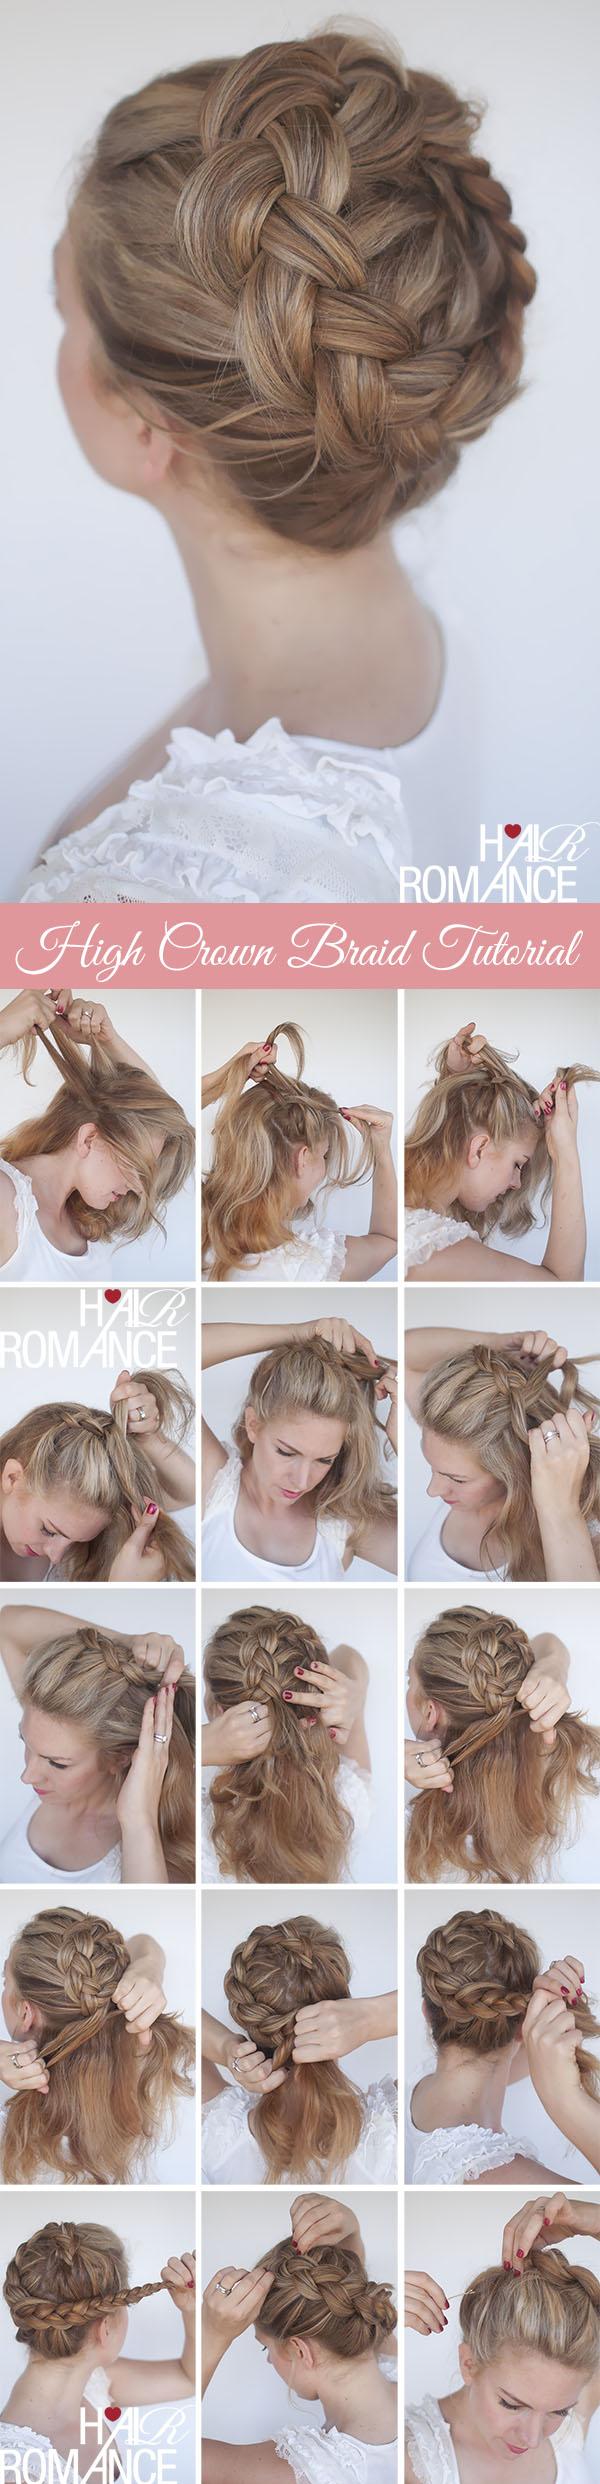 New braid tutorial  the high braided crown hairstyle